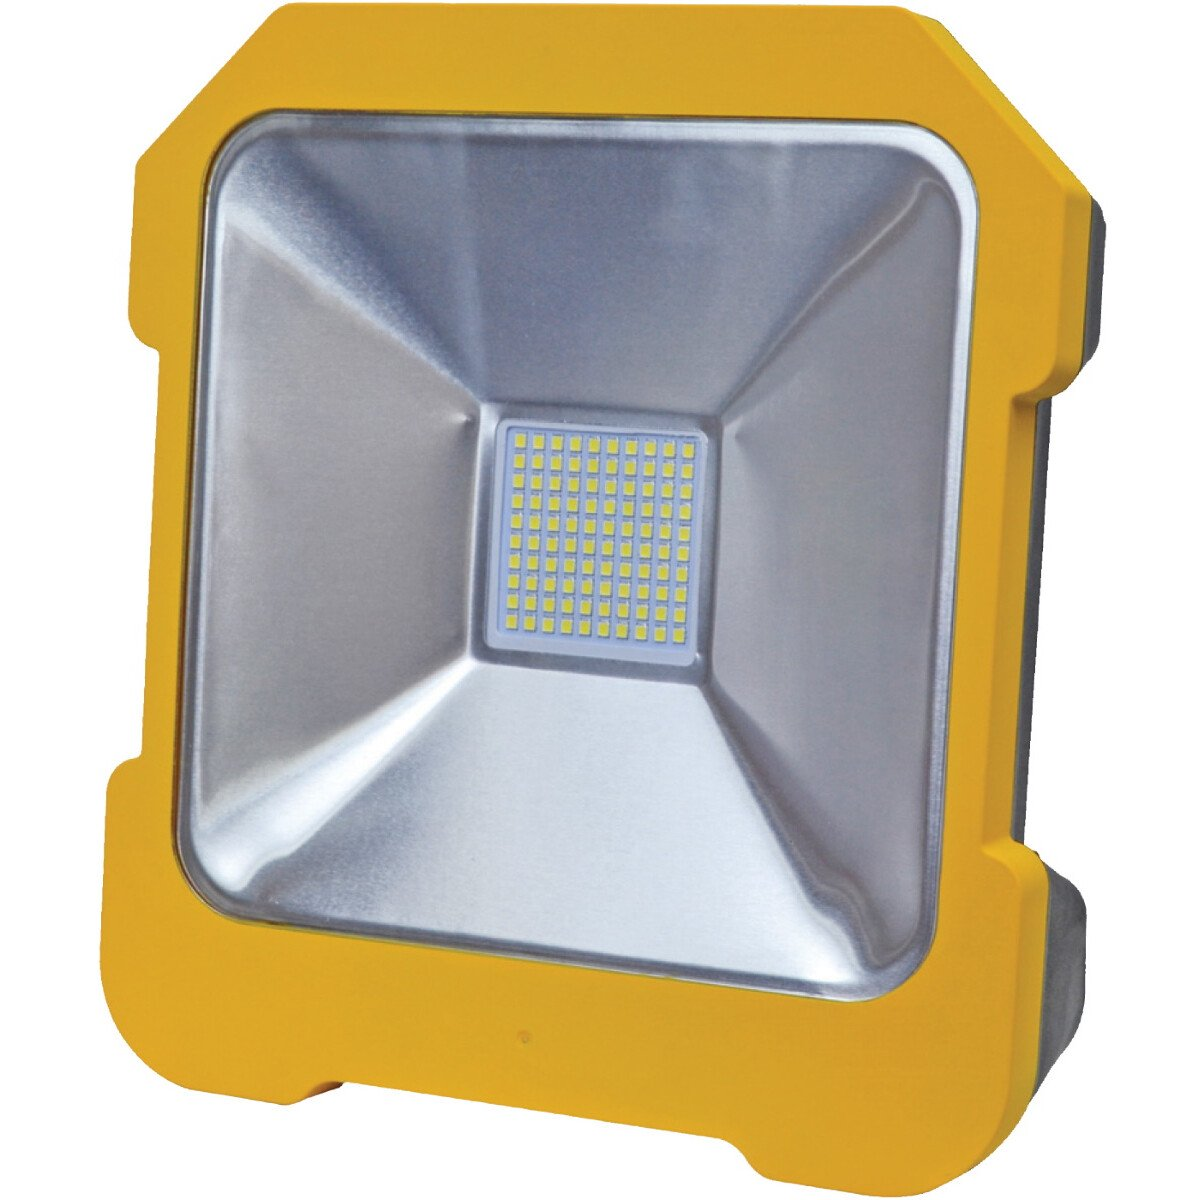 Spectre SP-17179 110Volt 20W SMD LED Portable Tasklight